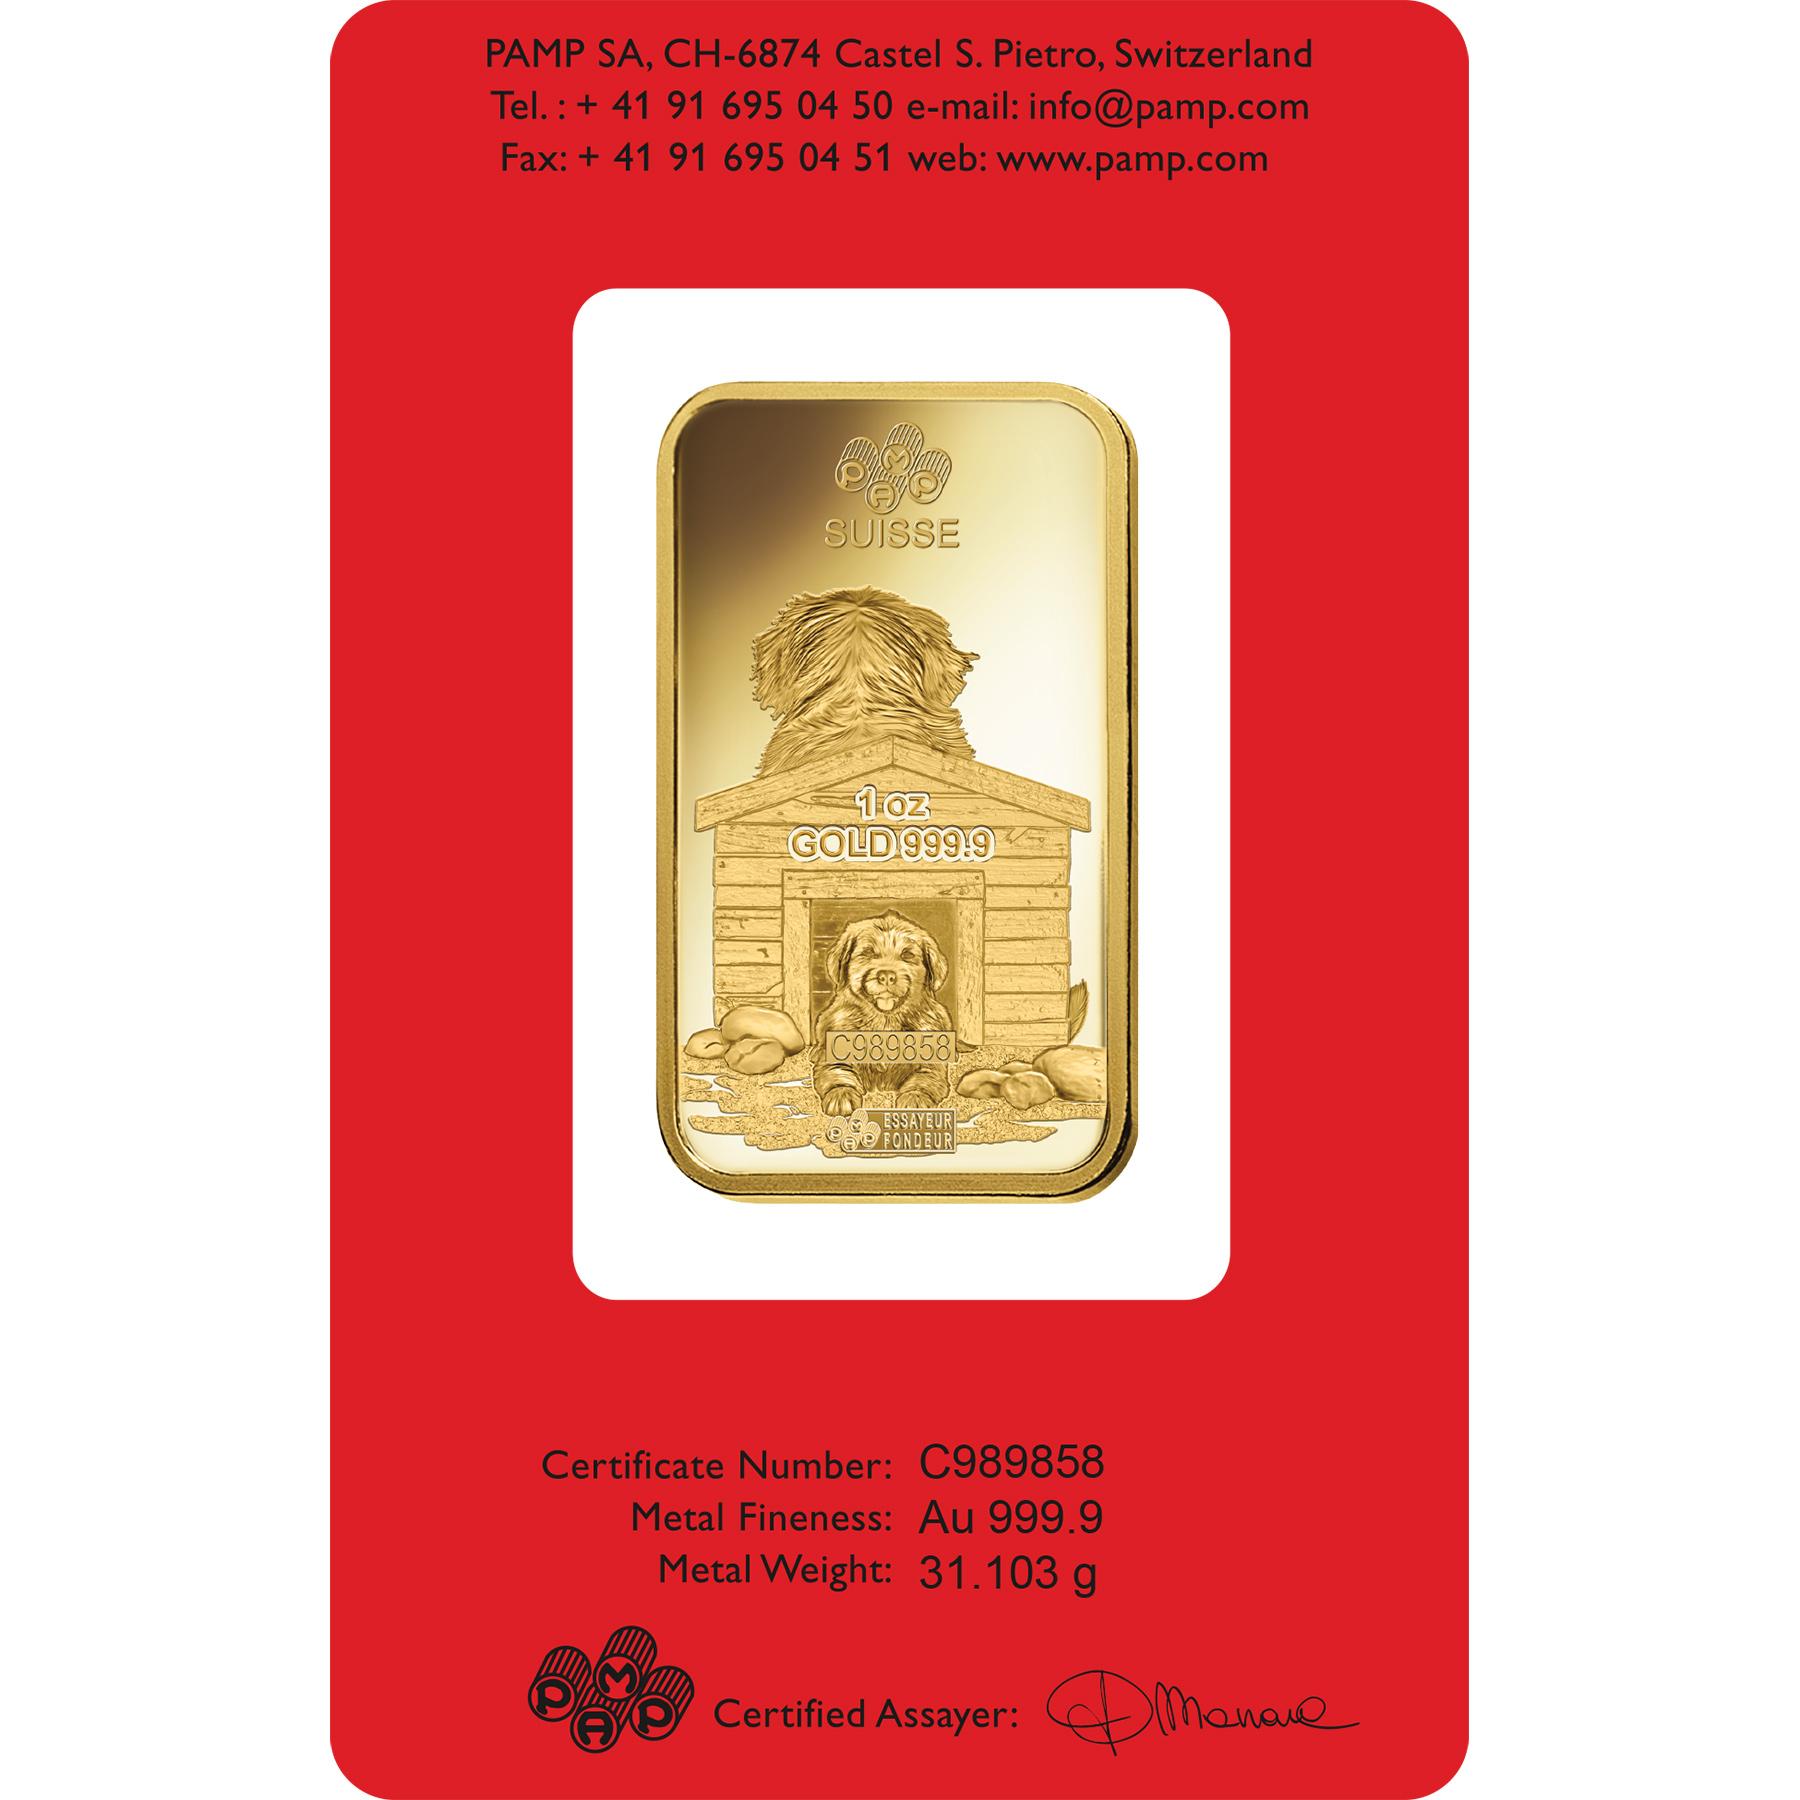 1 oncia lingottino d'oro - PAMP Suisse Lunar Cane